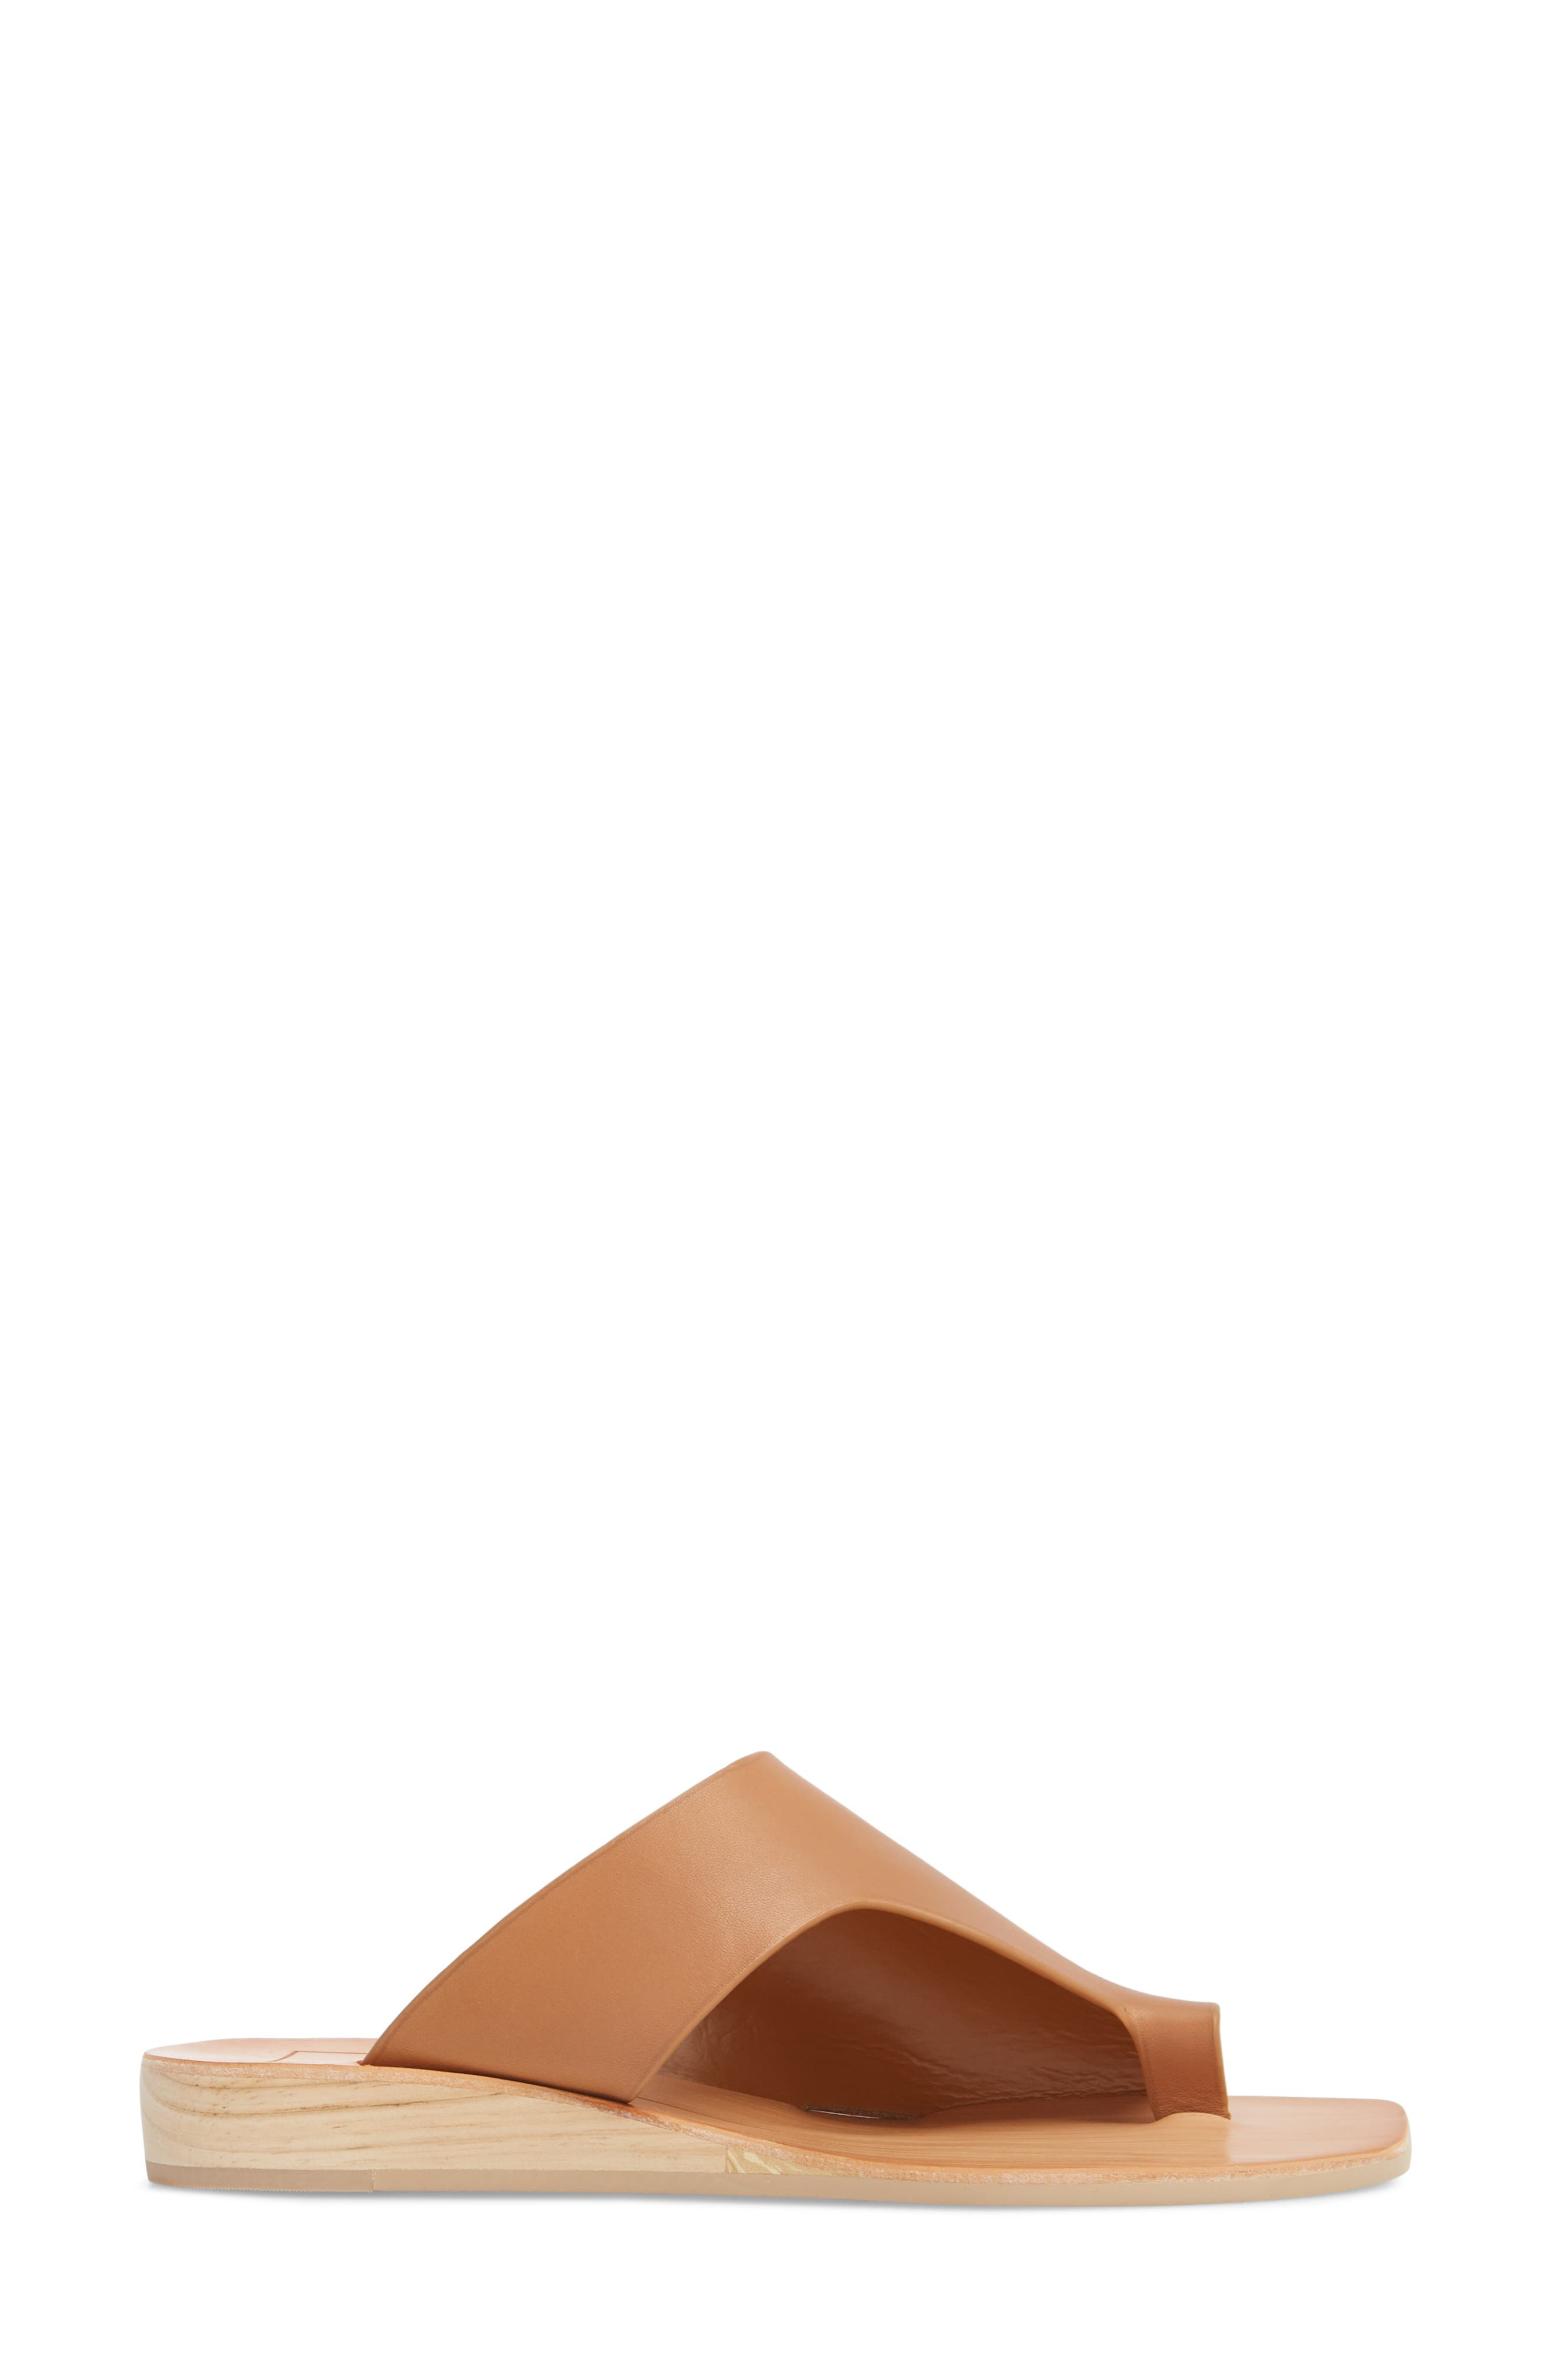 Hazle Asymmetrical Toe Loop Sandal,                             Alternate thumbnail 8, color,